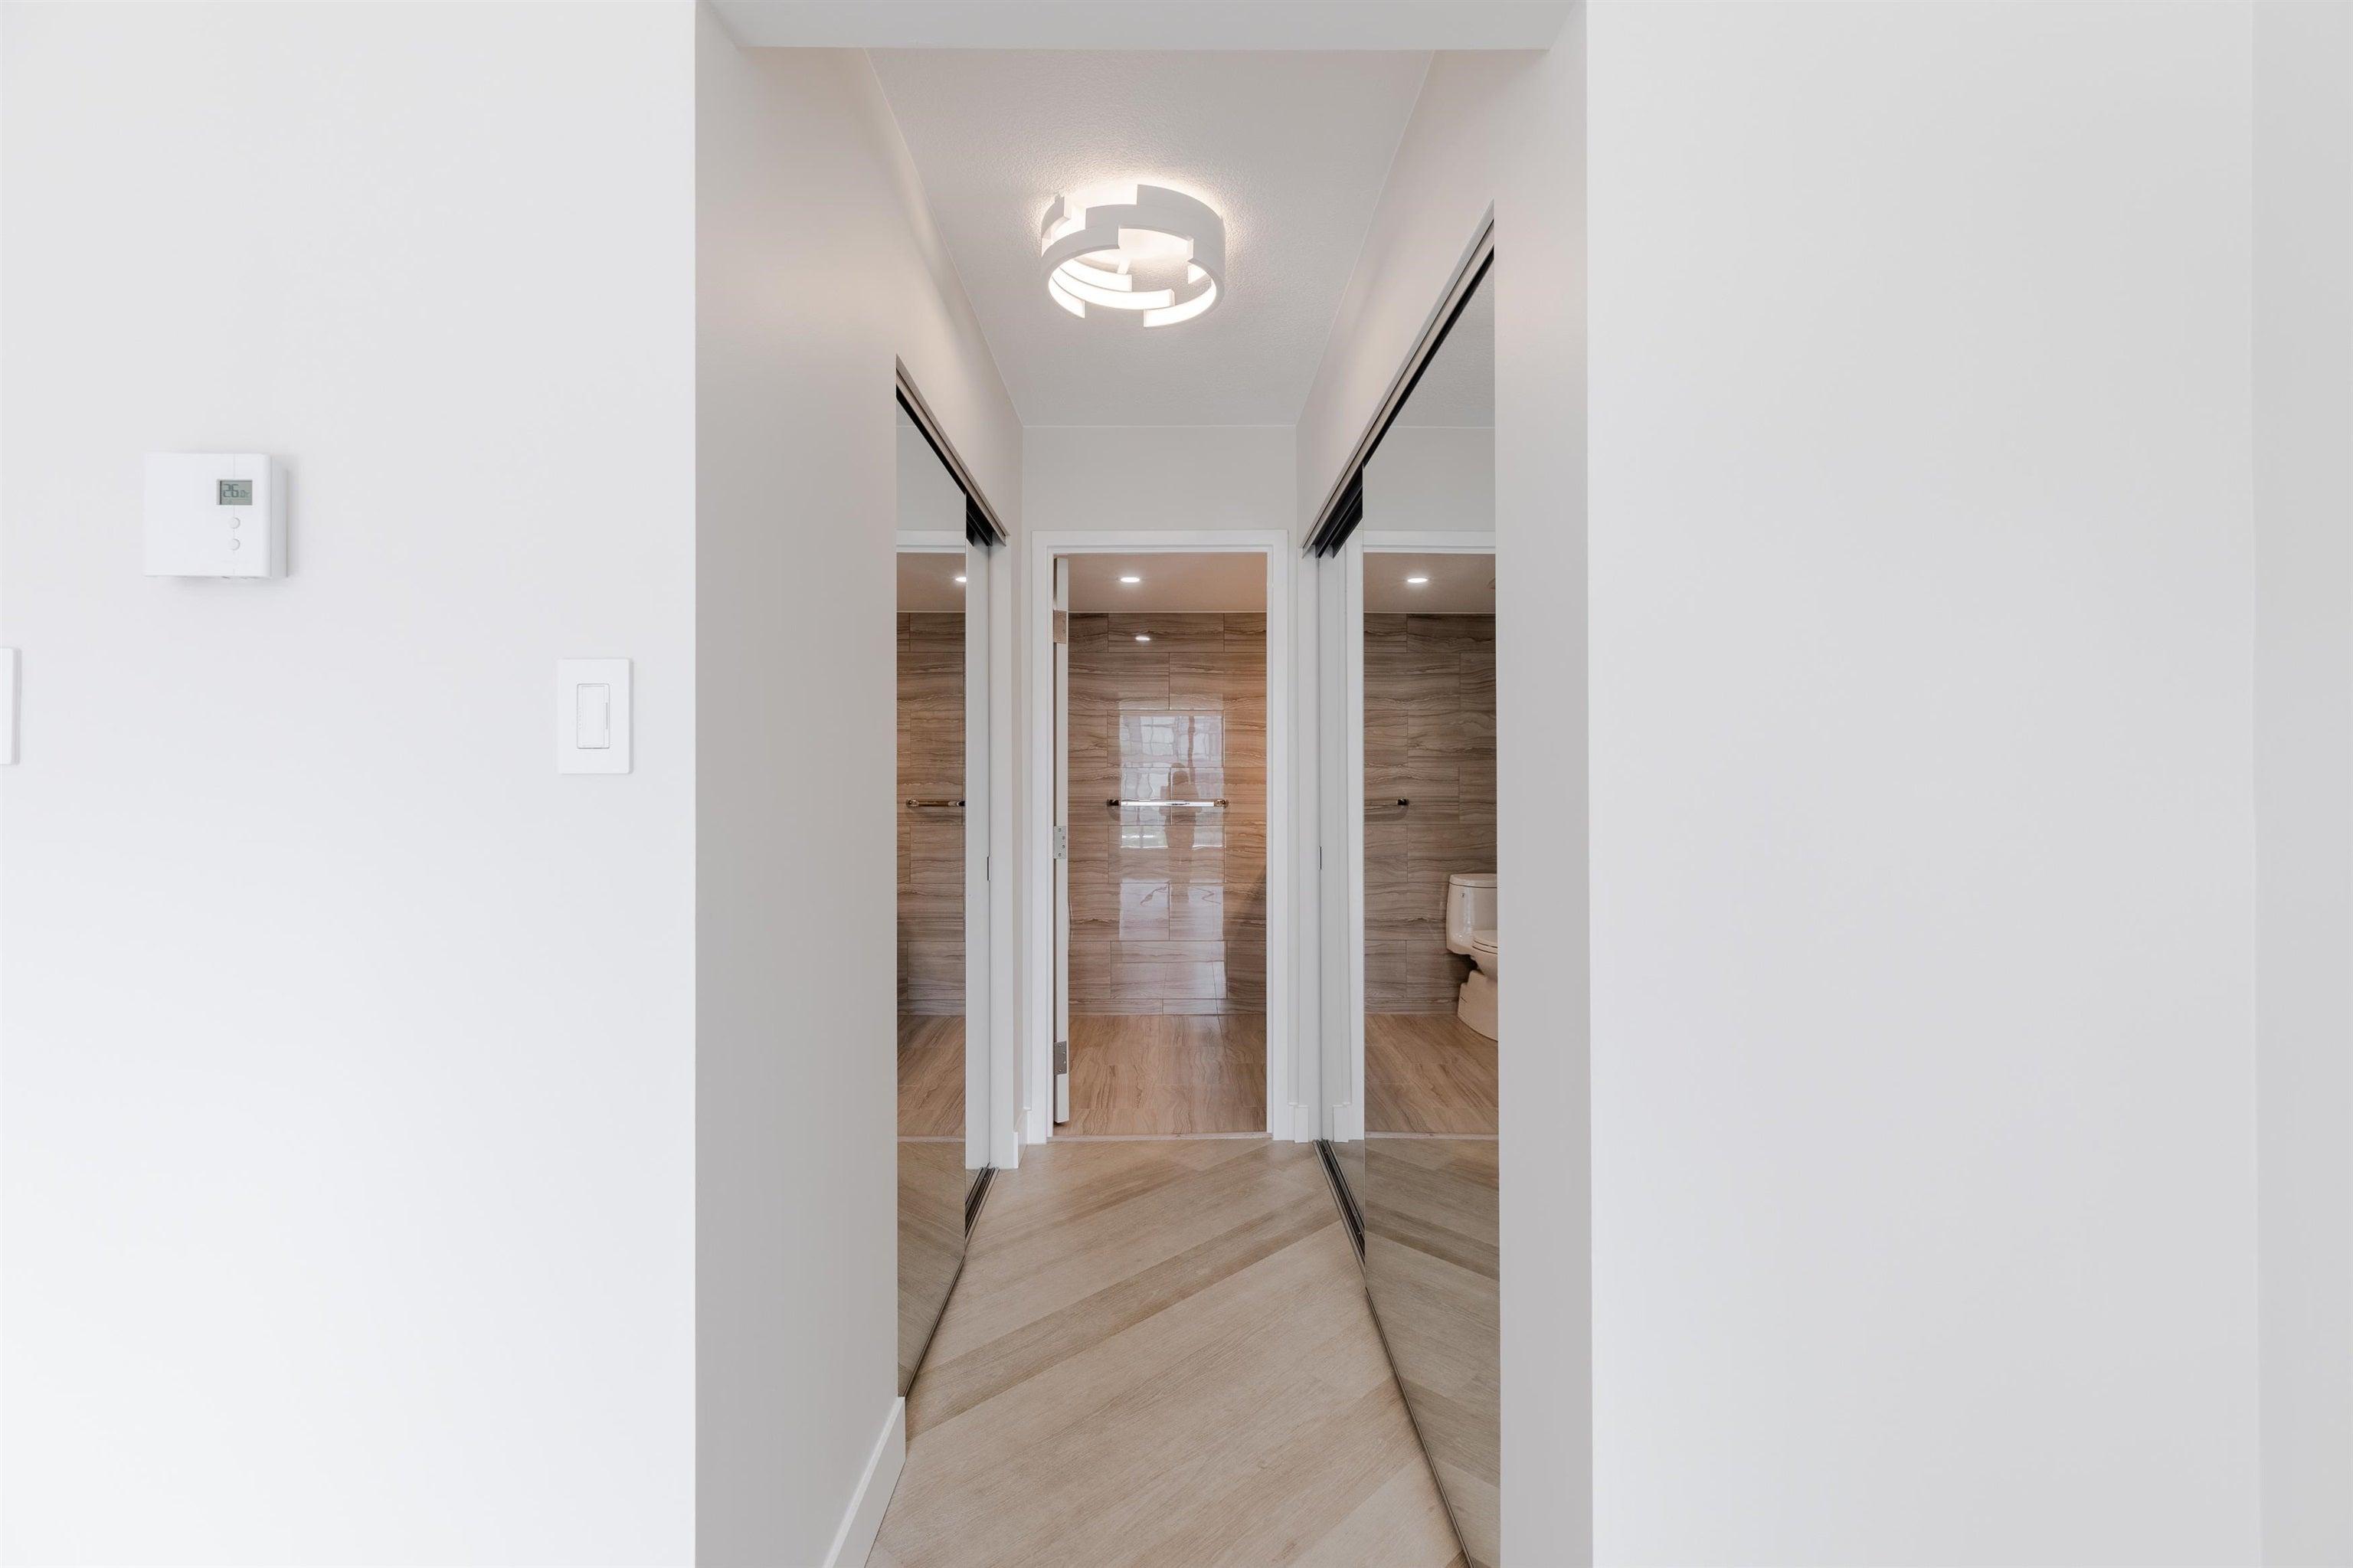 406 1450 PENNYFARTHING DRIVE - False Creek Apartment/Condo for sale, 2 Bedrooms (R2617259) - #24